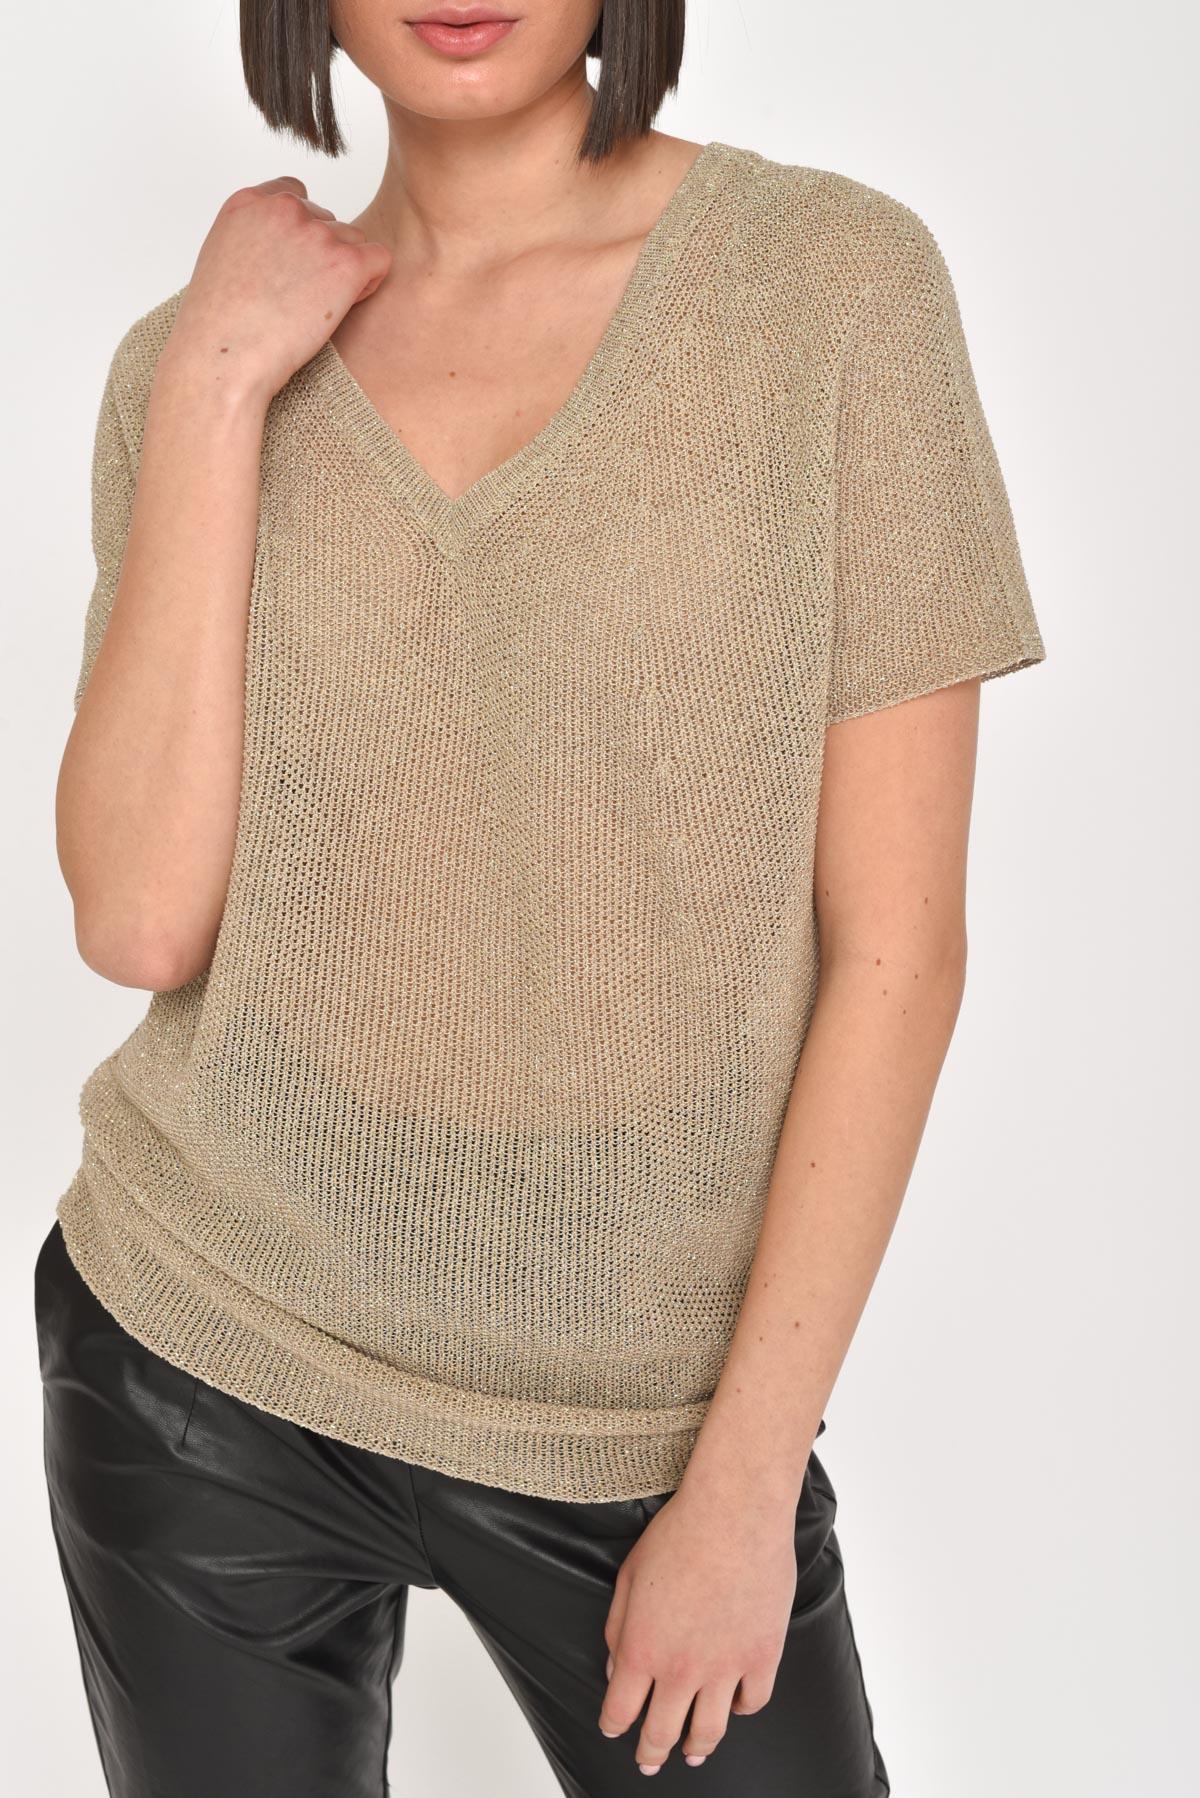 T-SHIRT LUREX IN COTONE for women - BEIGE - Paquito Pronto Moda Shop Online